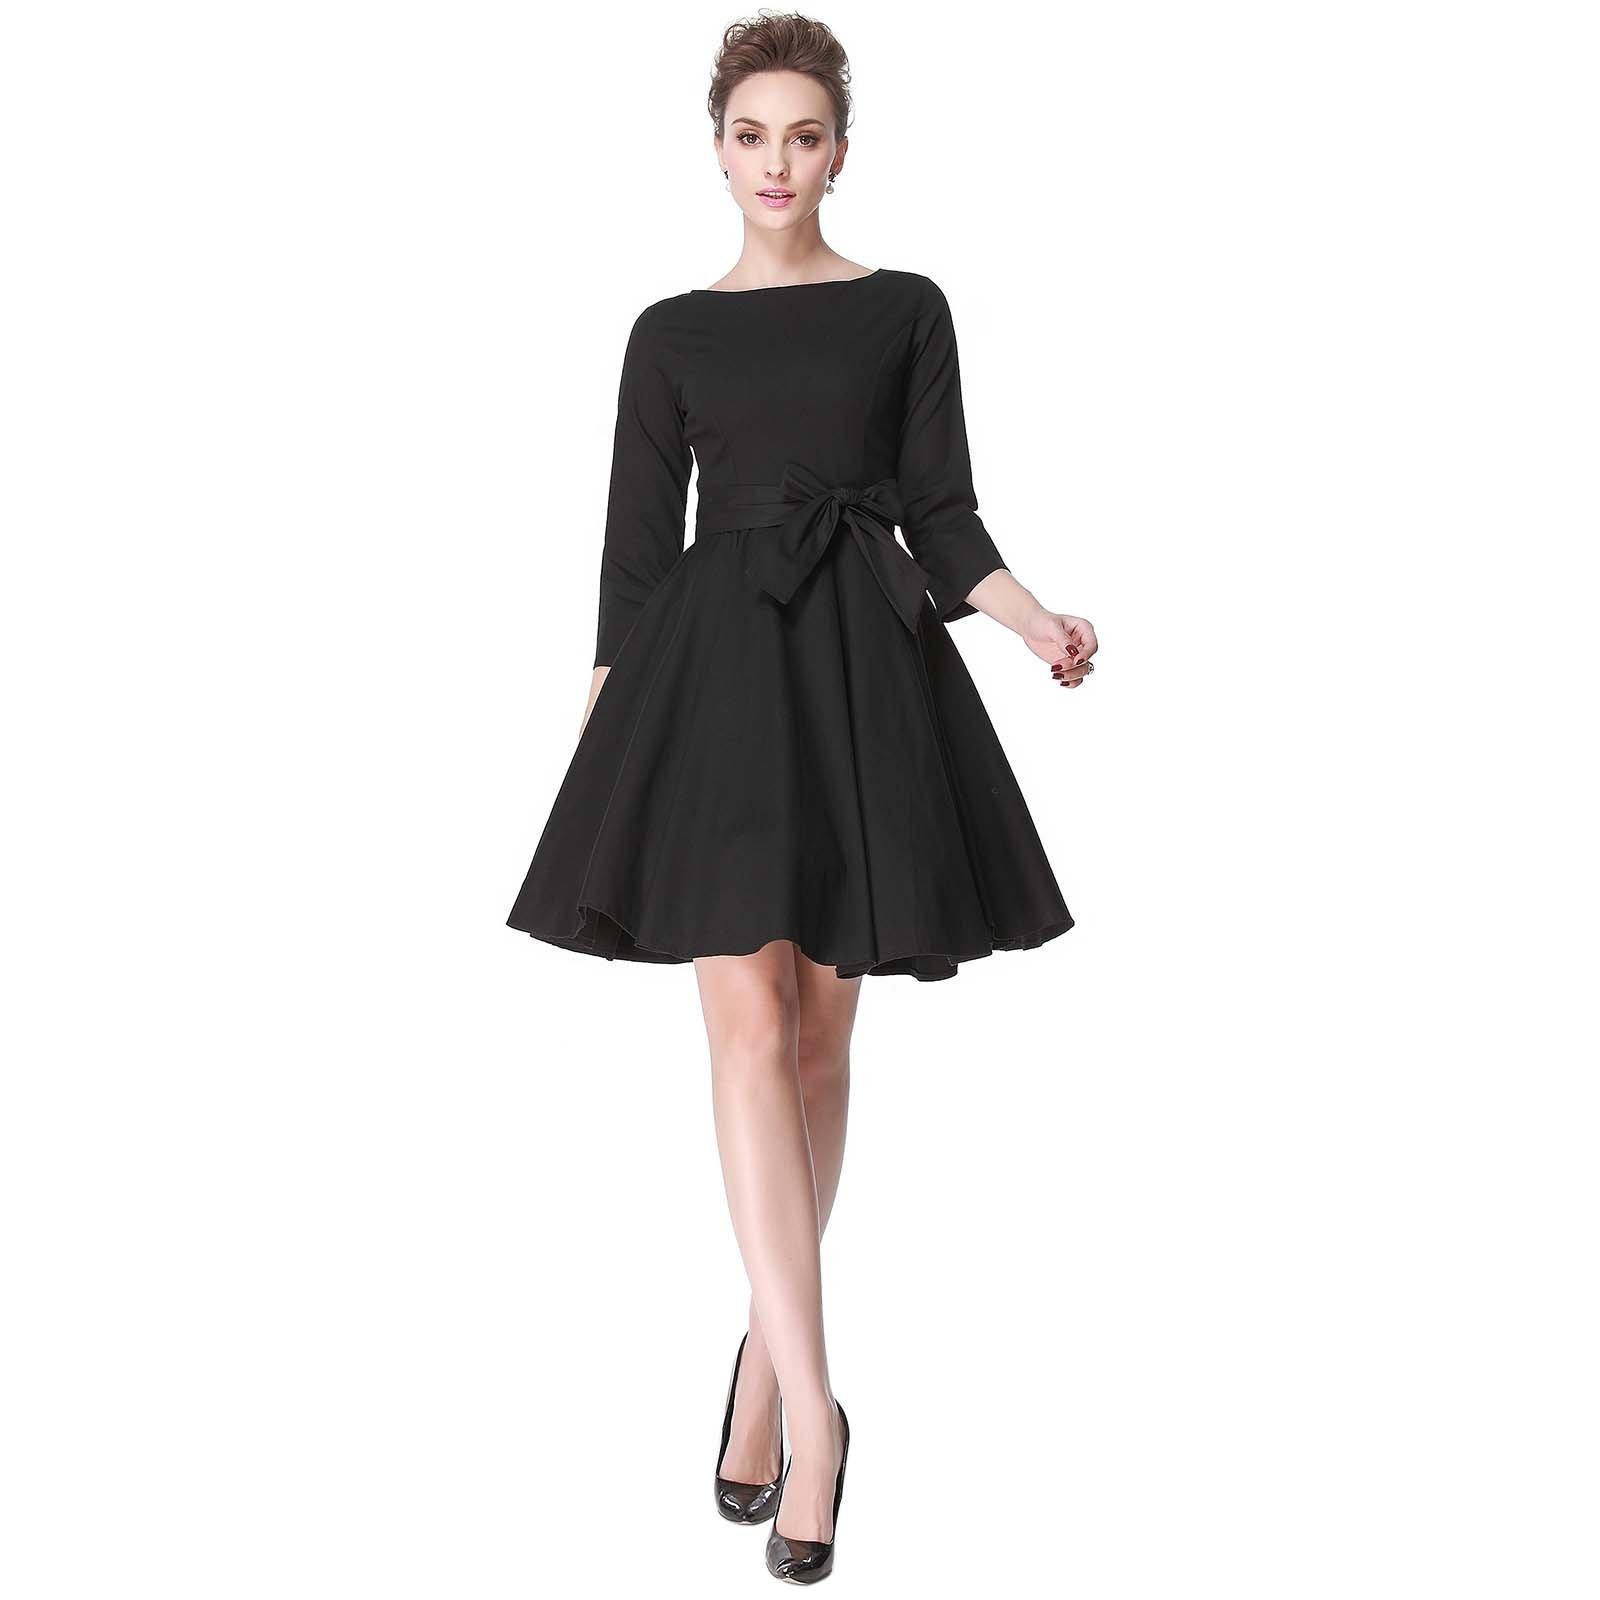 Heroecol 50s 60s Hepburn 3/4 Sleeve Style Vintage Retro Swing Rockailly Dresses Size XL Color Black by Heroecol (Image #1)